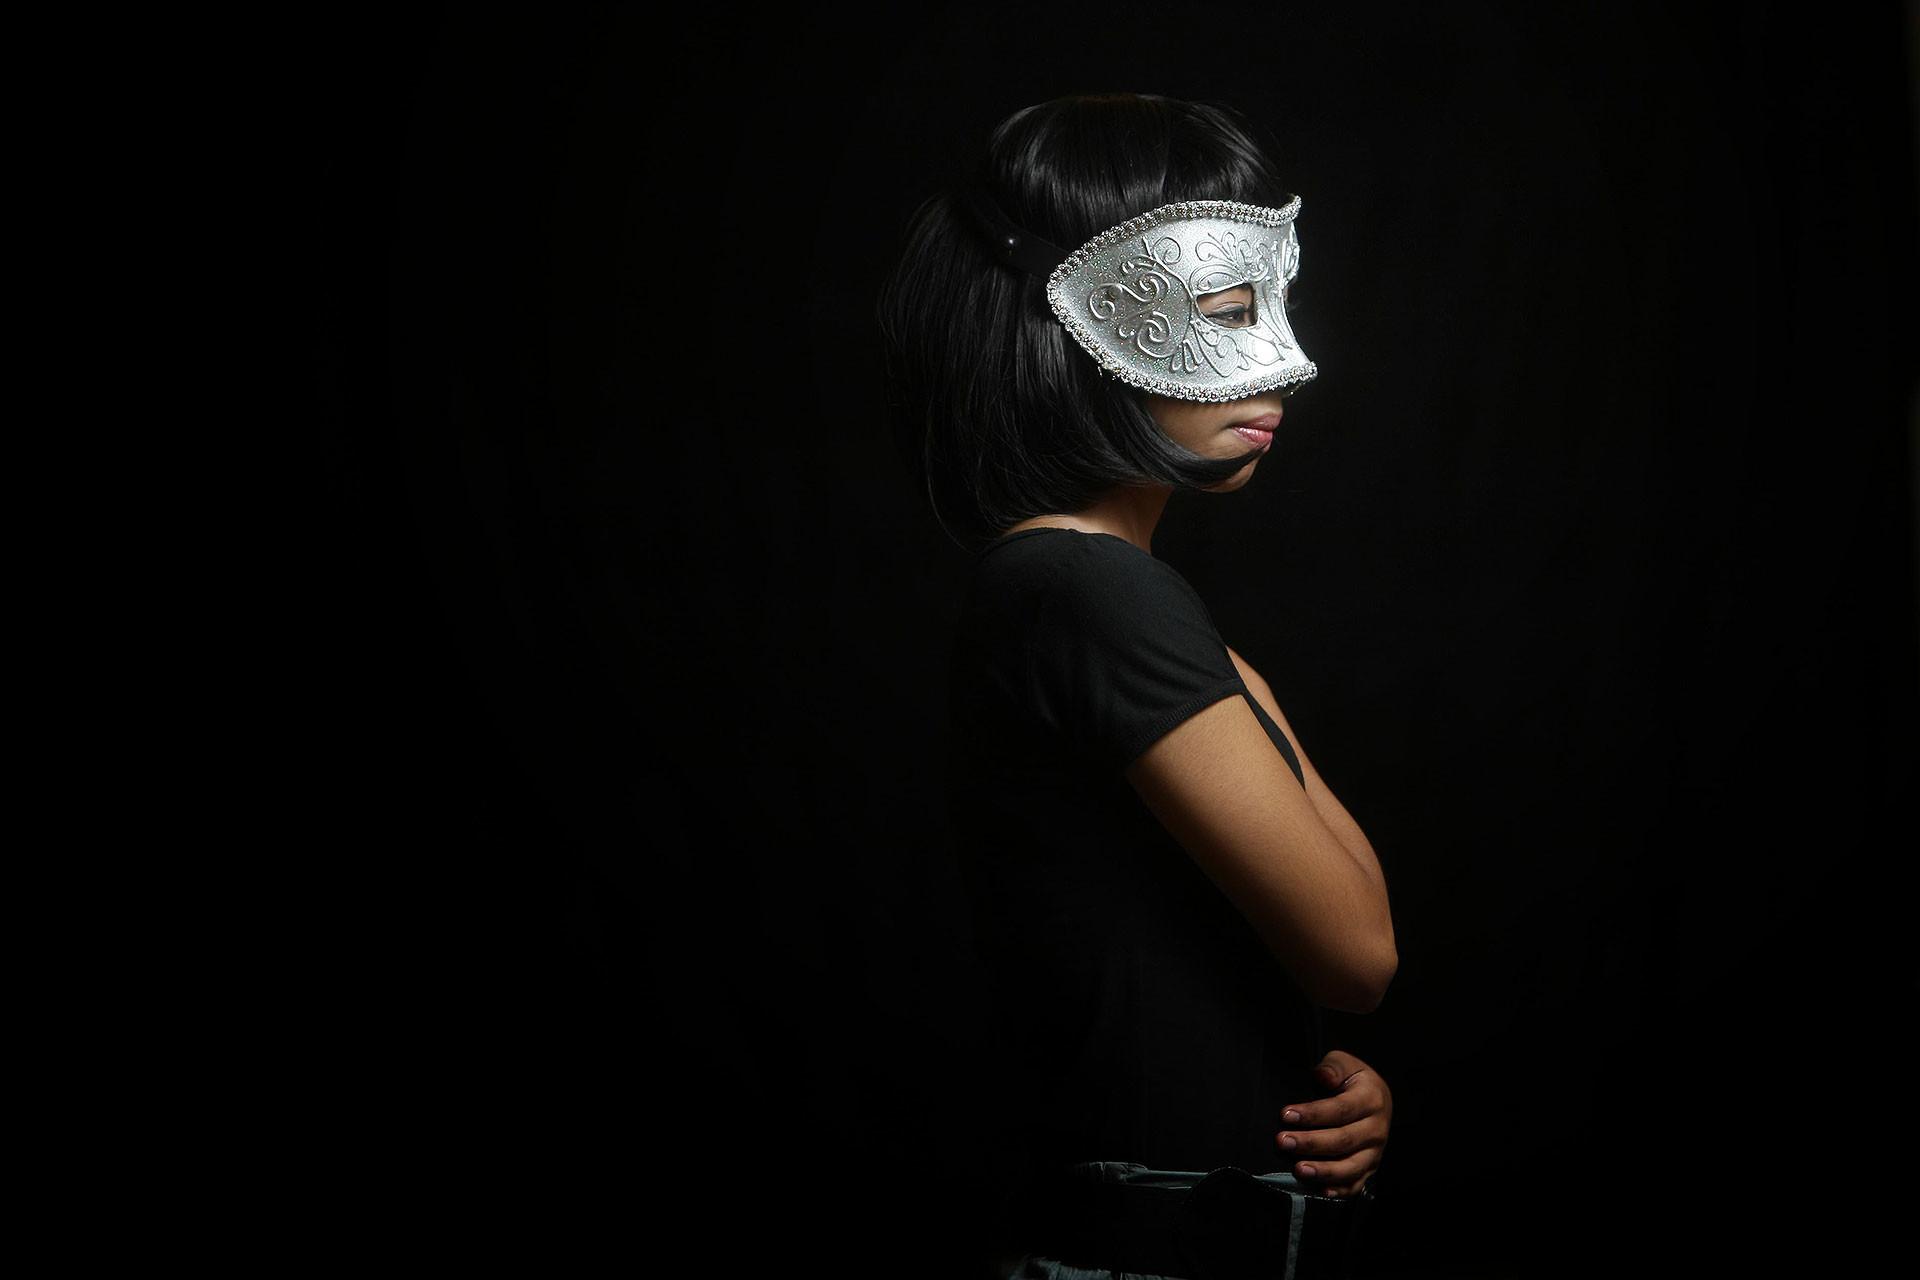 Фото: © Flickr/sumaryanto bronto